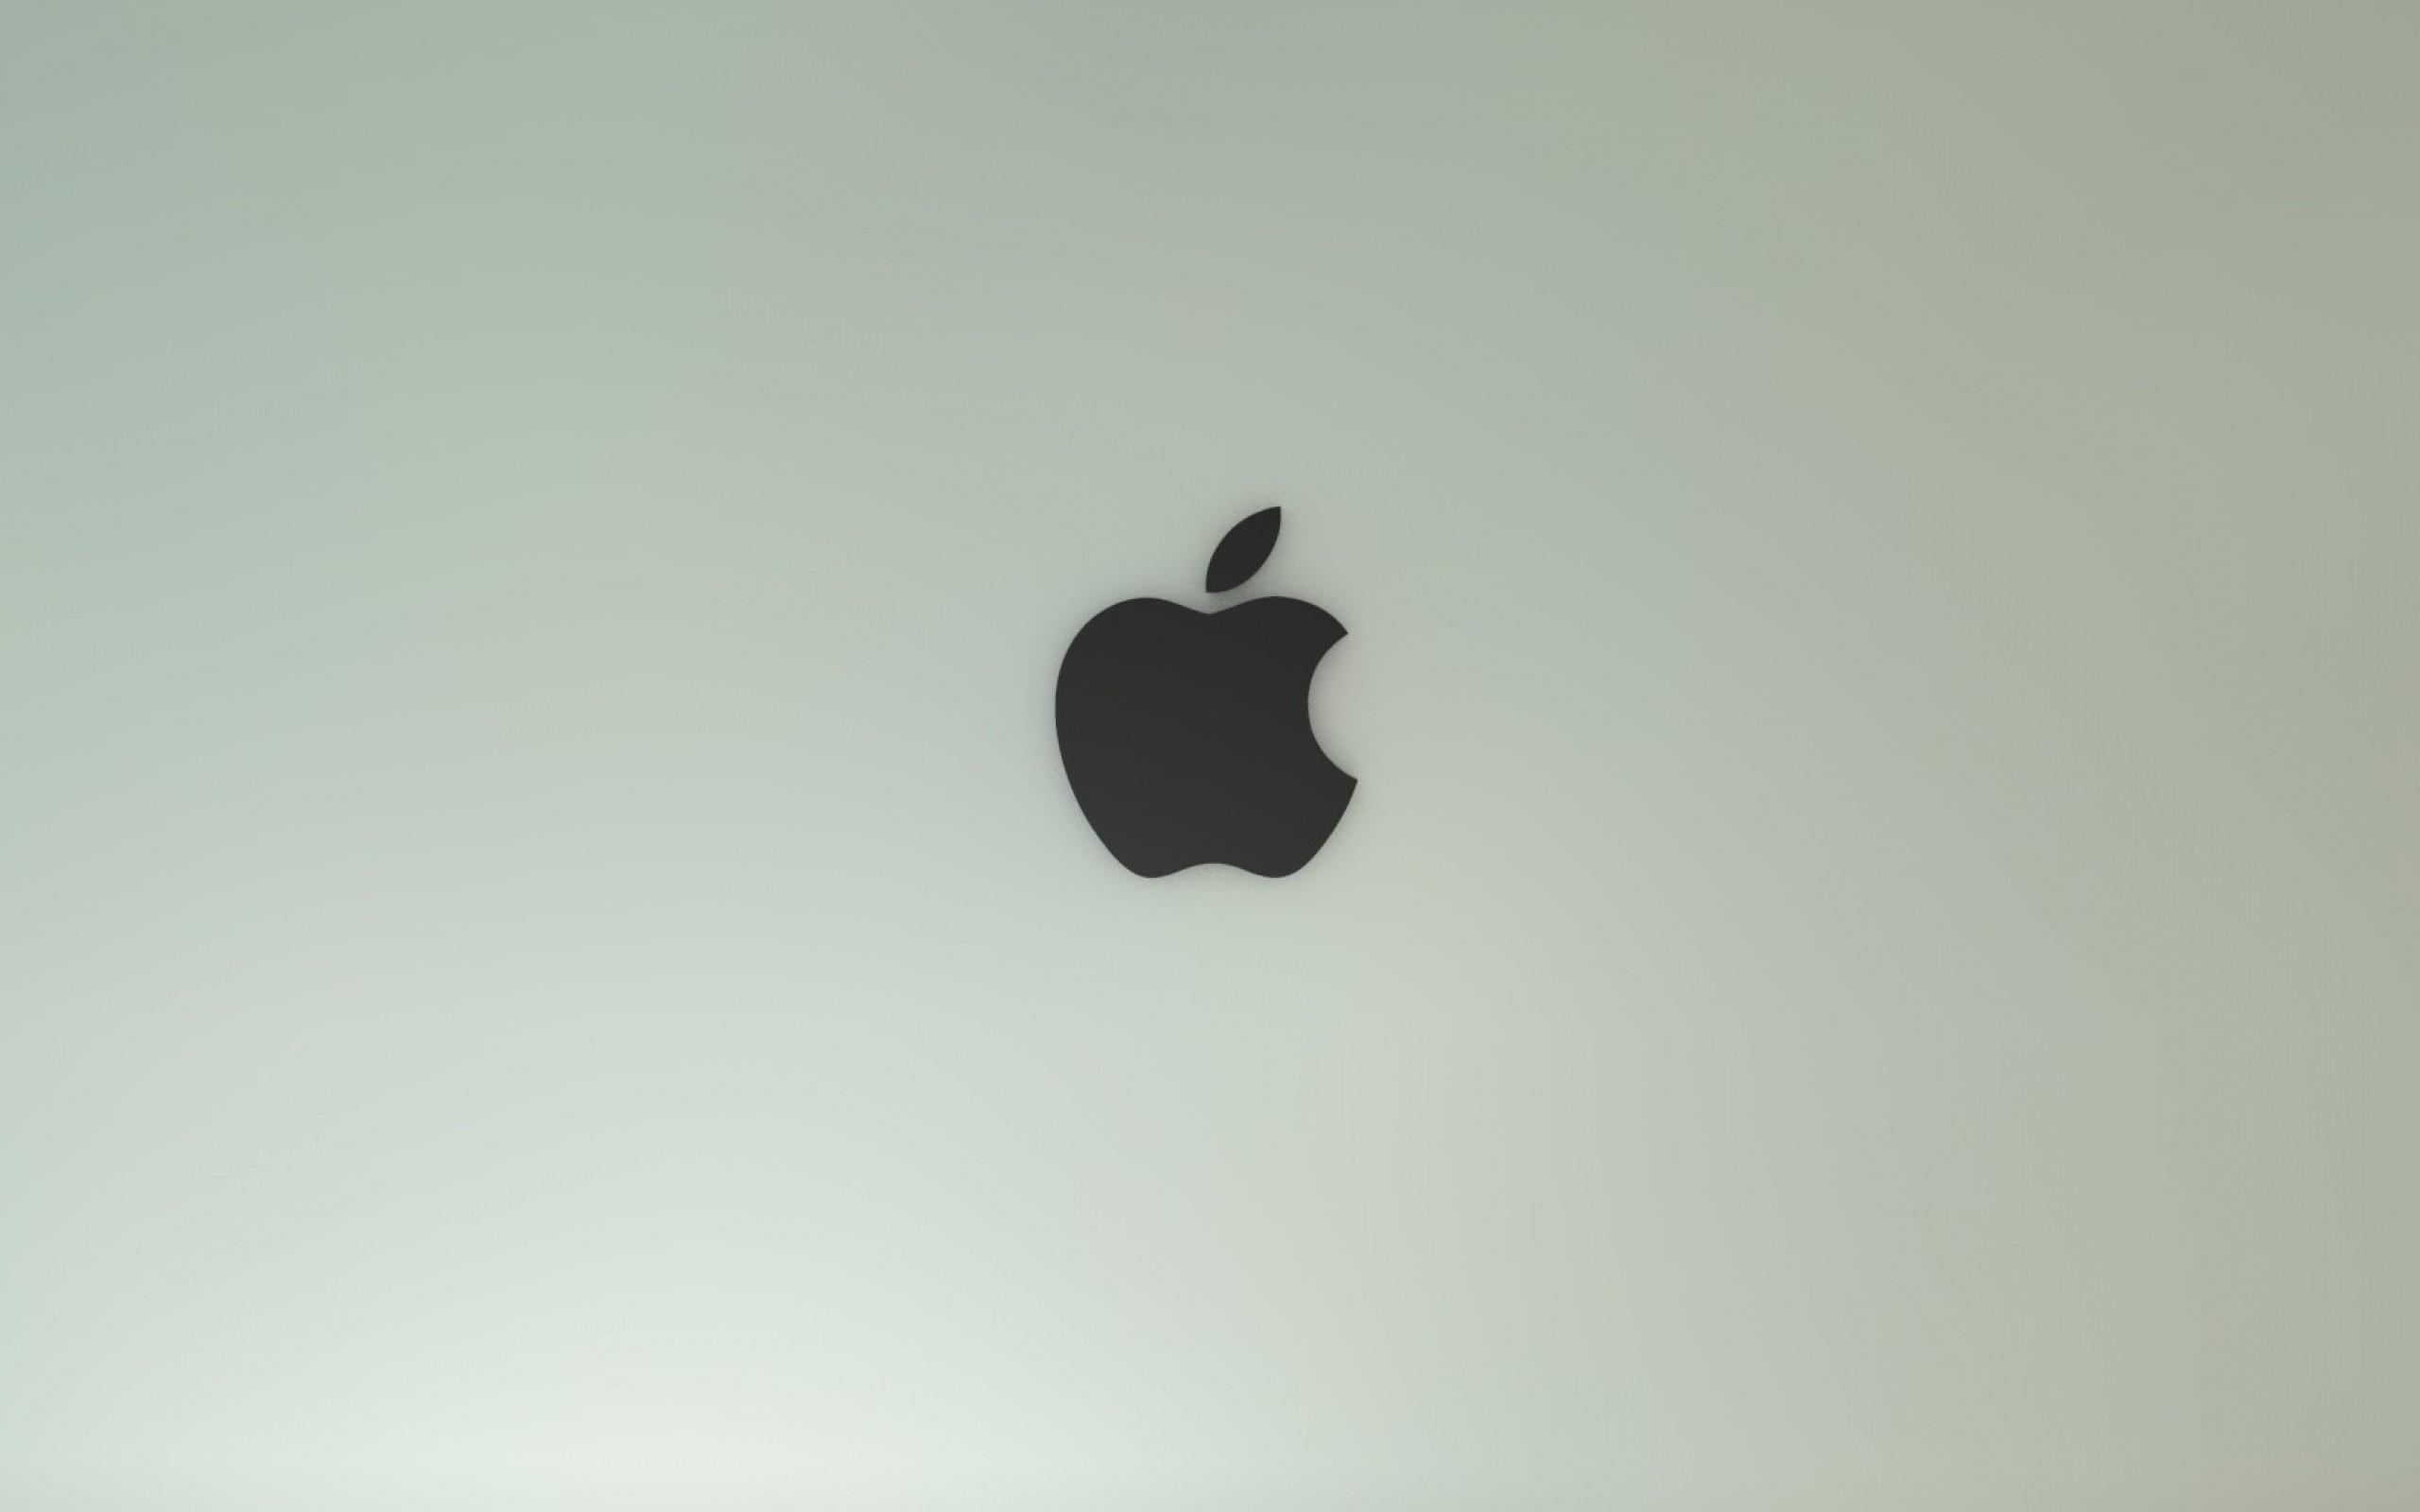 Wallpaper apple, mac, brand, background, solid